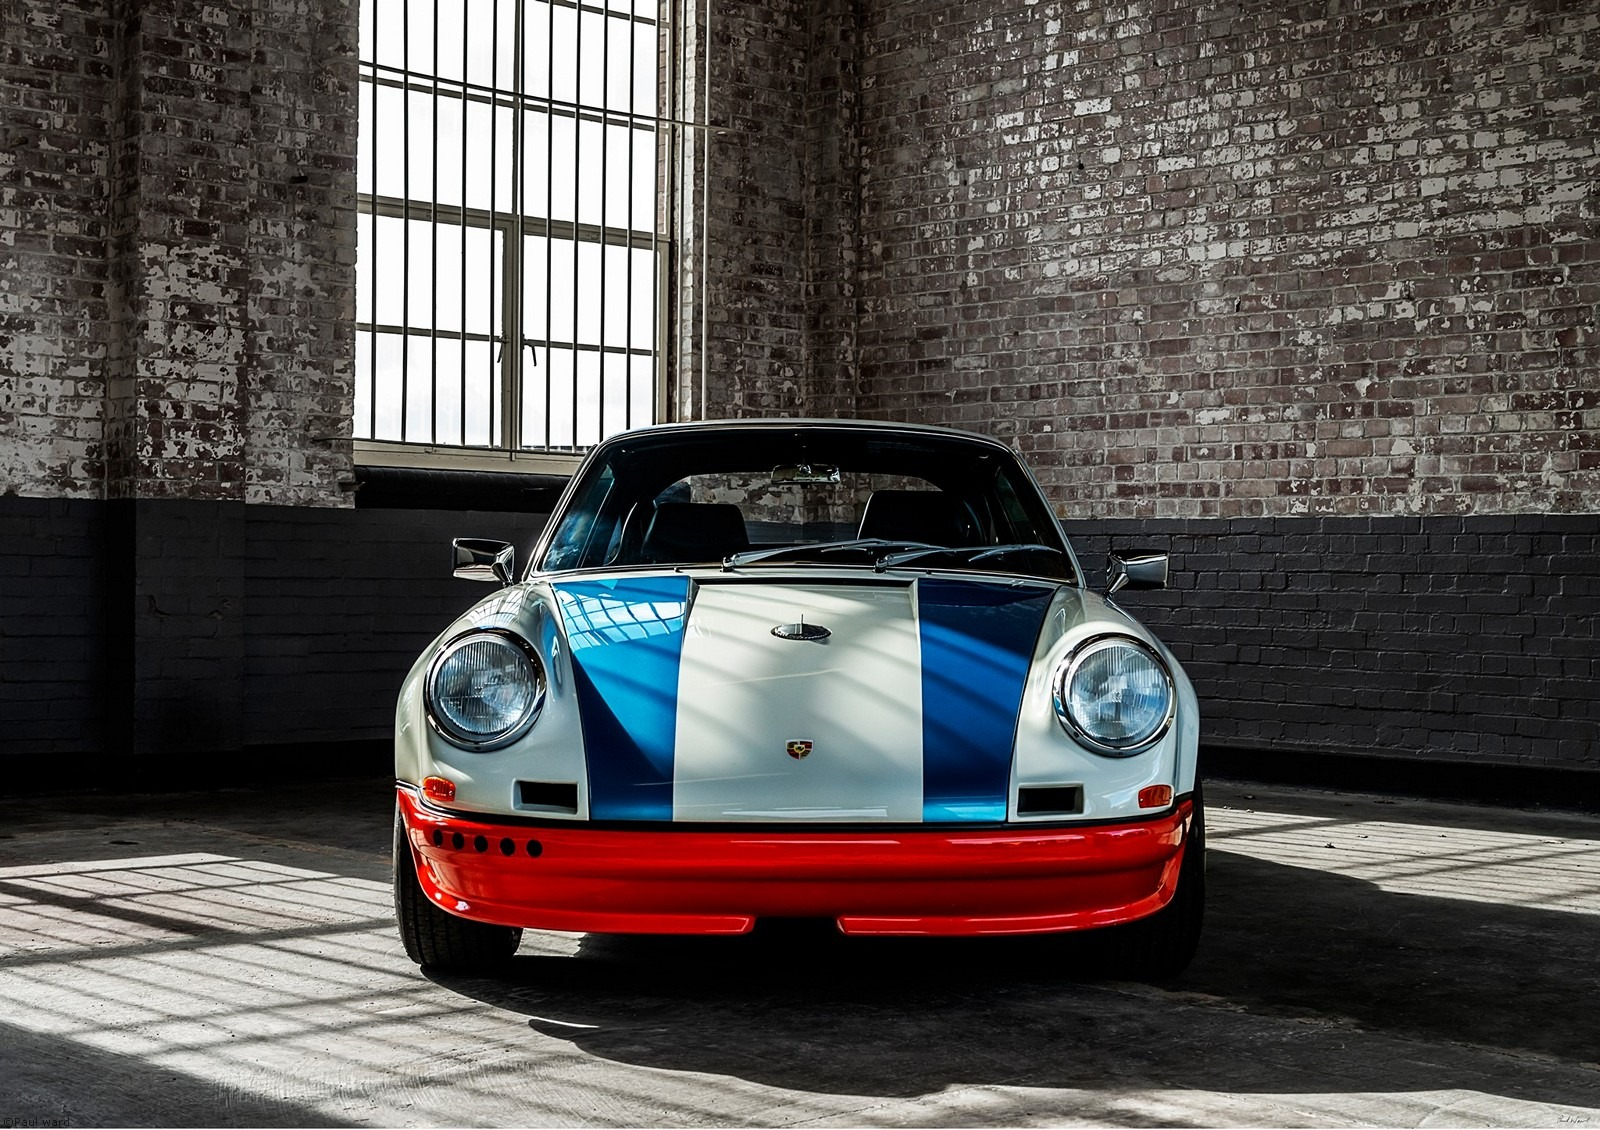 Magnus Walker Porsche 911 by Birmingham car photographer Paul Ward